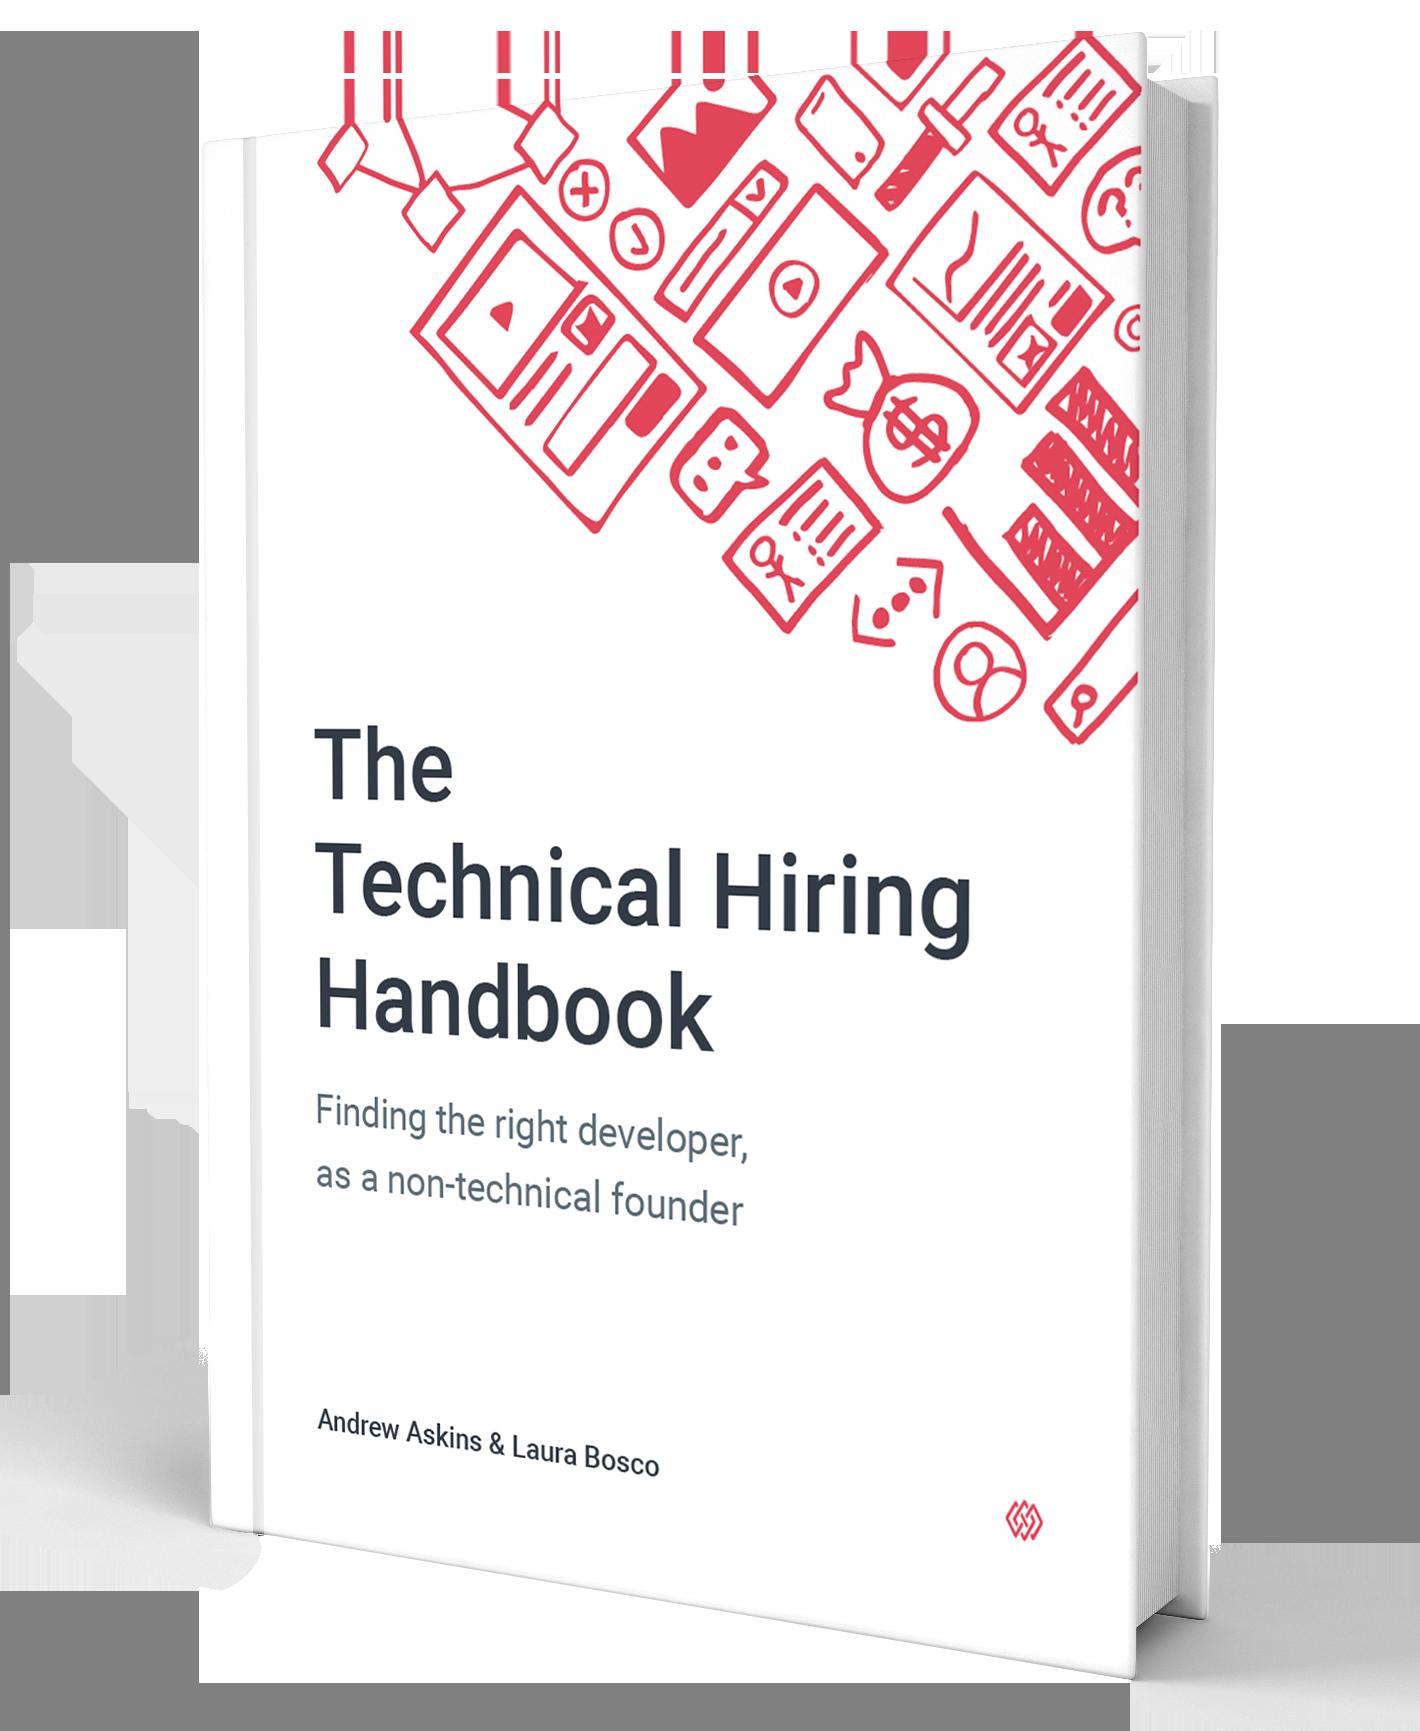 The Technical Hiring Handbook for Non-technical Founders